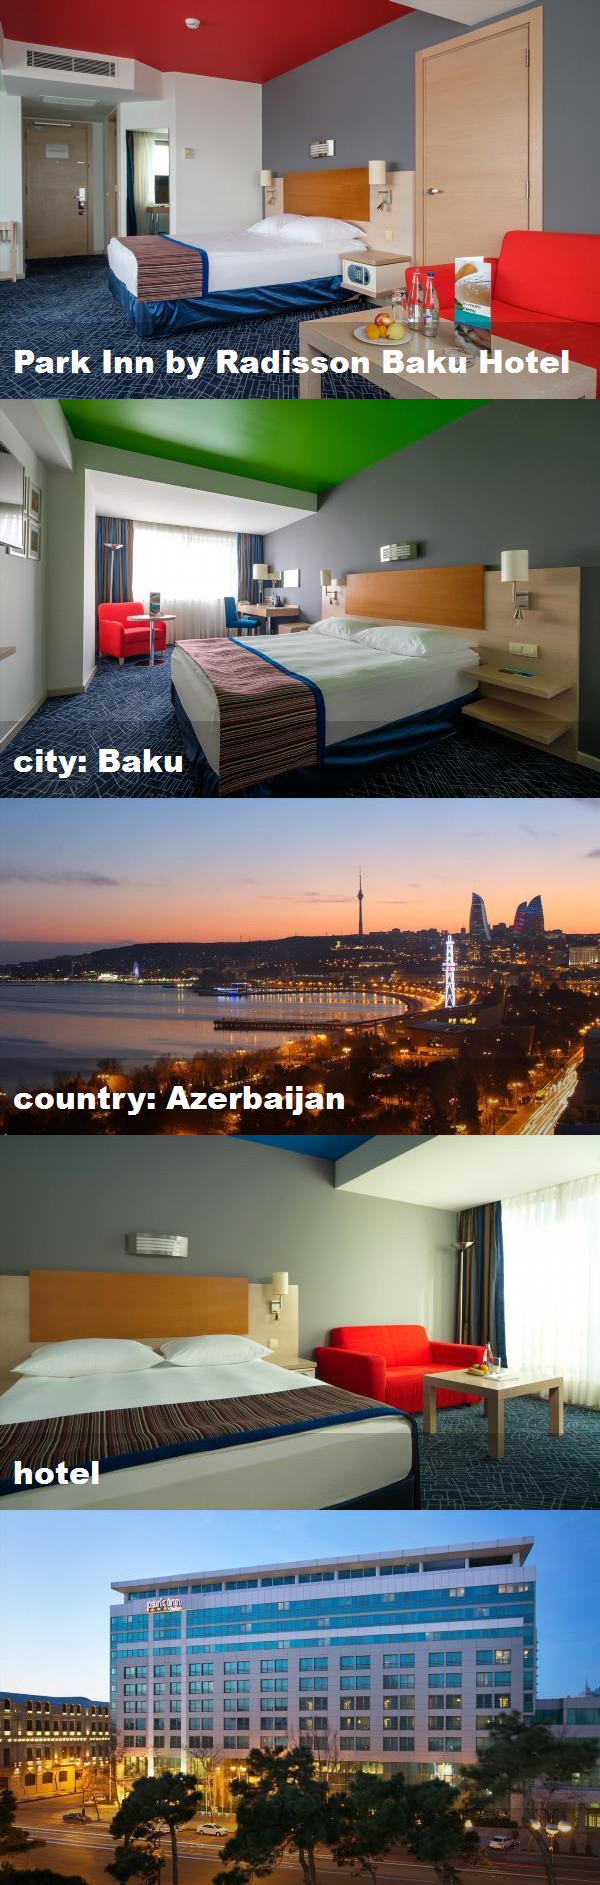 Park Inn By Radisson Baku Hotel City Baku Country Azerbaijan Hotel Baku Hotels Hotel Radisson